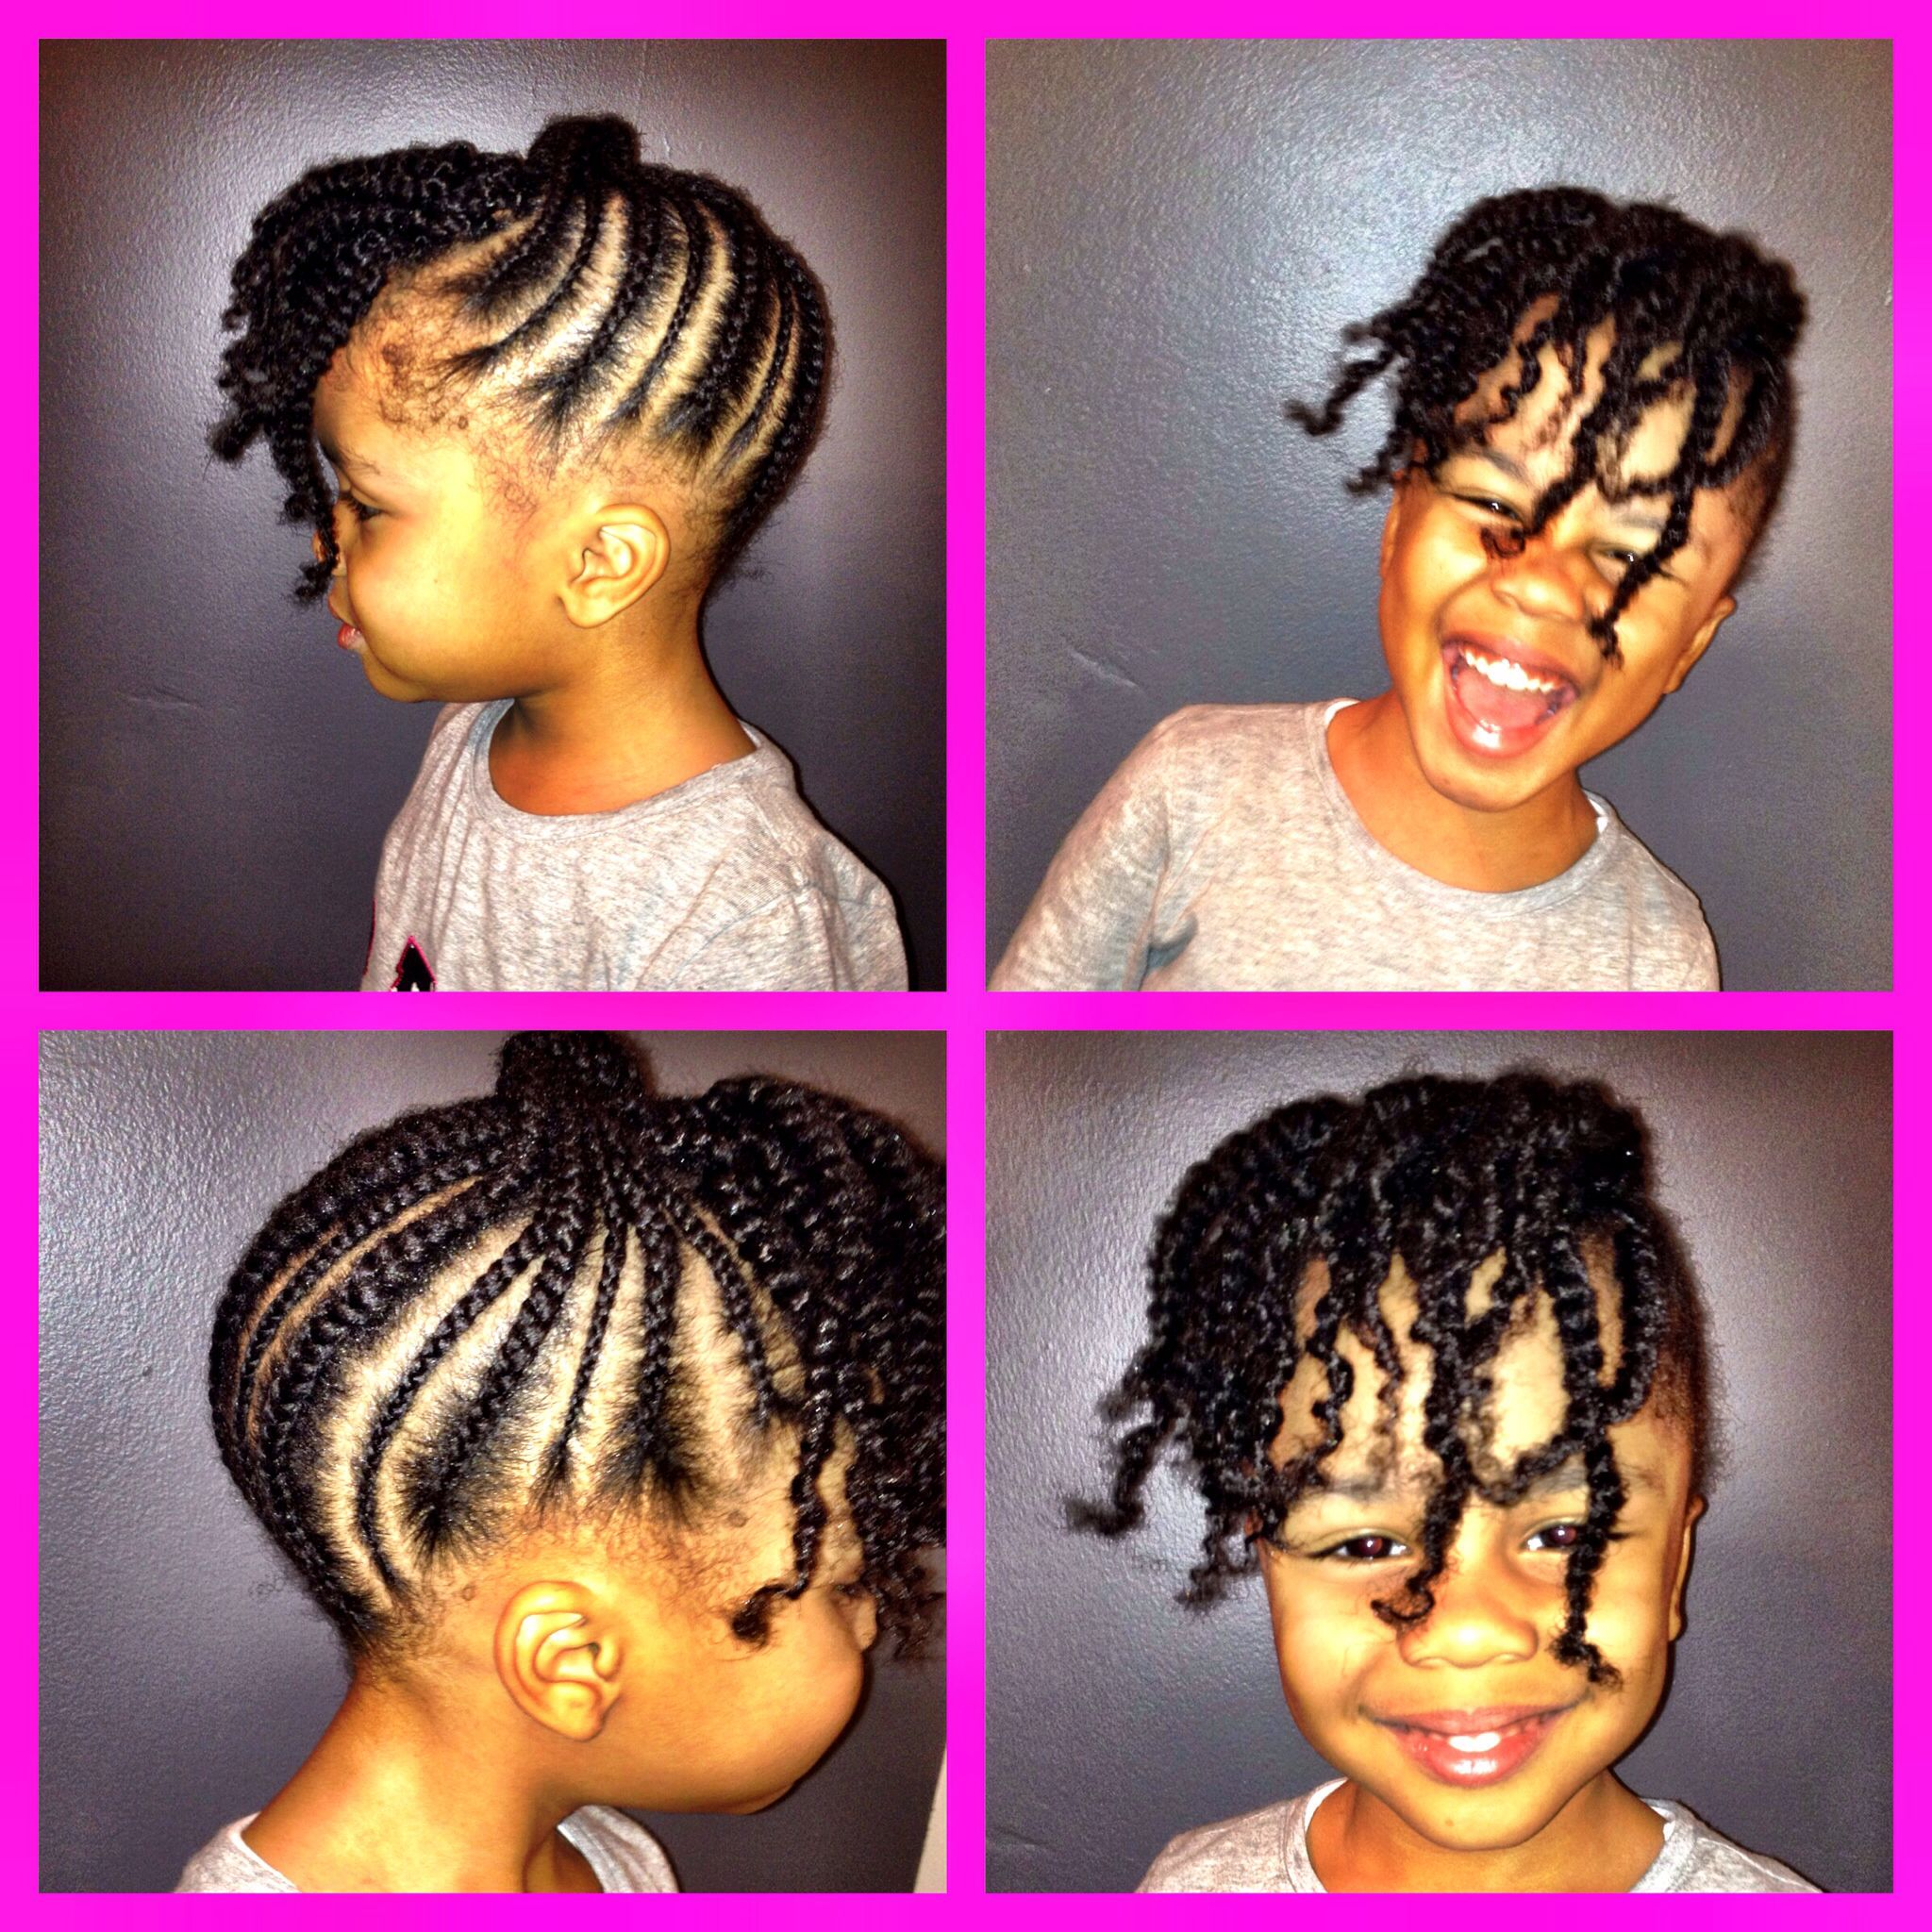 Kiddie Corner Kid Friendly Hairstyles Natural Or Transitioning I Am Team Natural Natural Hair Styles Hair Styles Natural Hairstyles For Kids